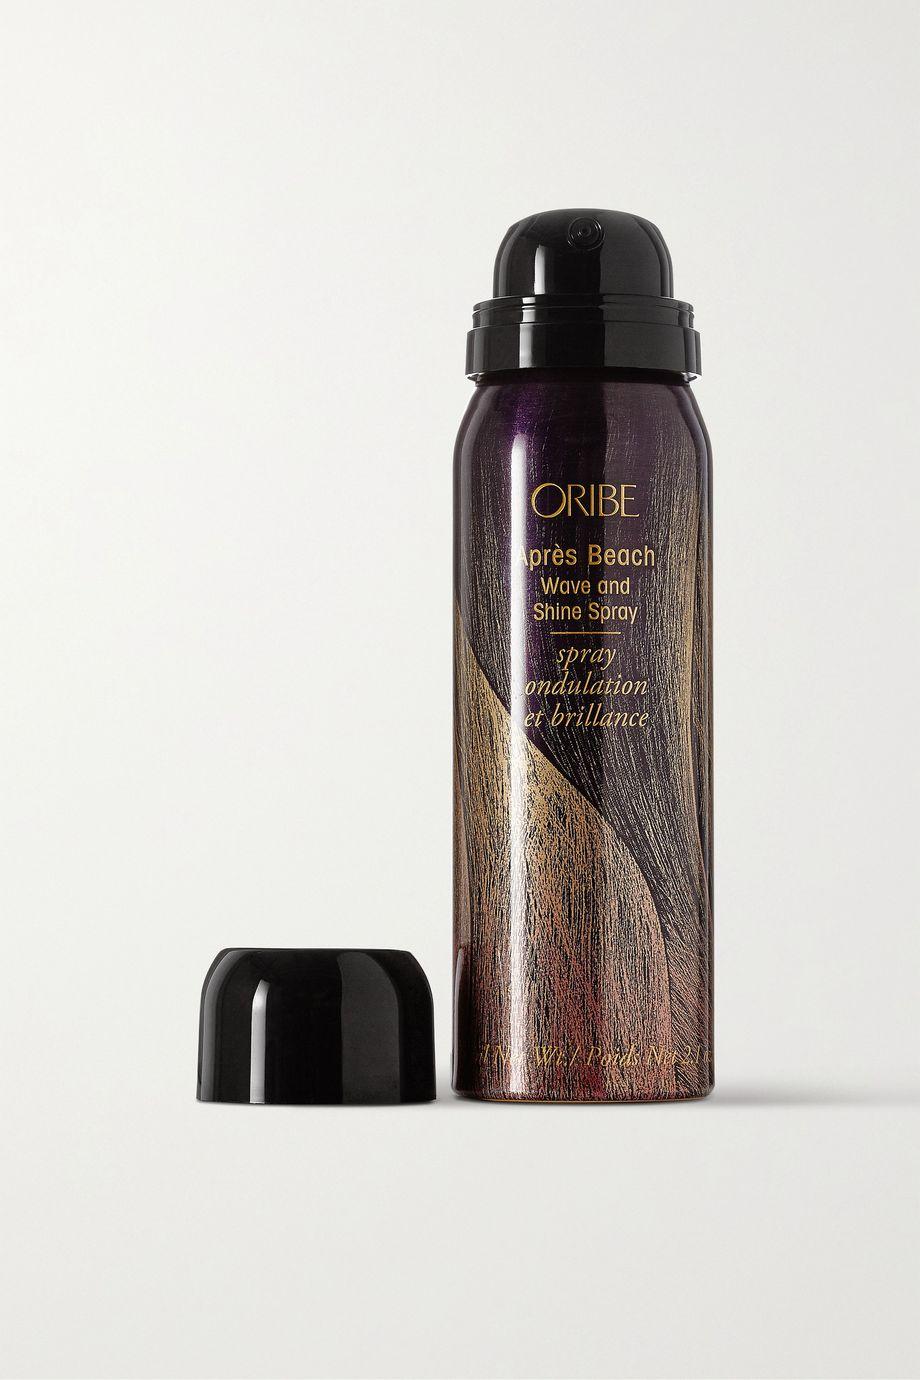 Oribe Travel-Sized Aprés Beach Wave and Shine Spray, 75ml